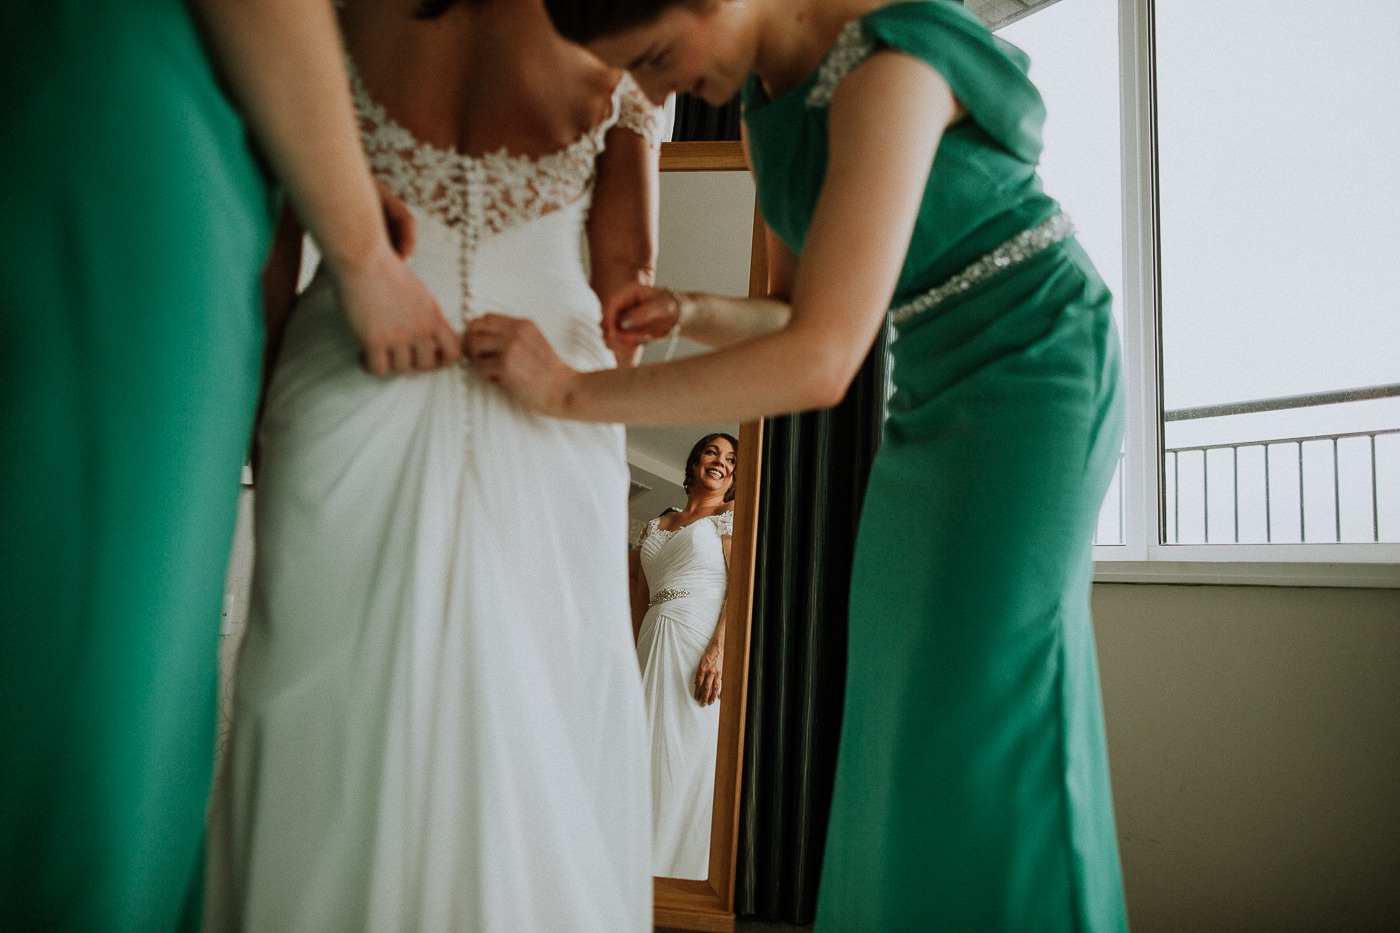 A woman wearing a dress